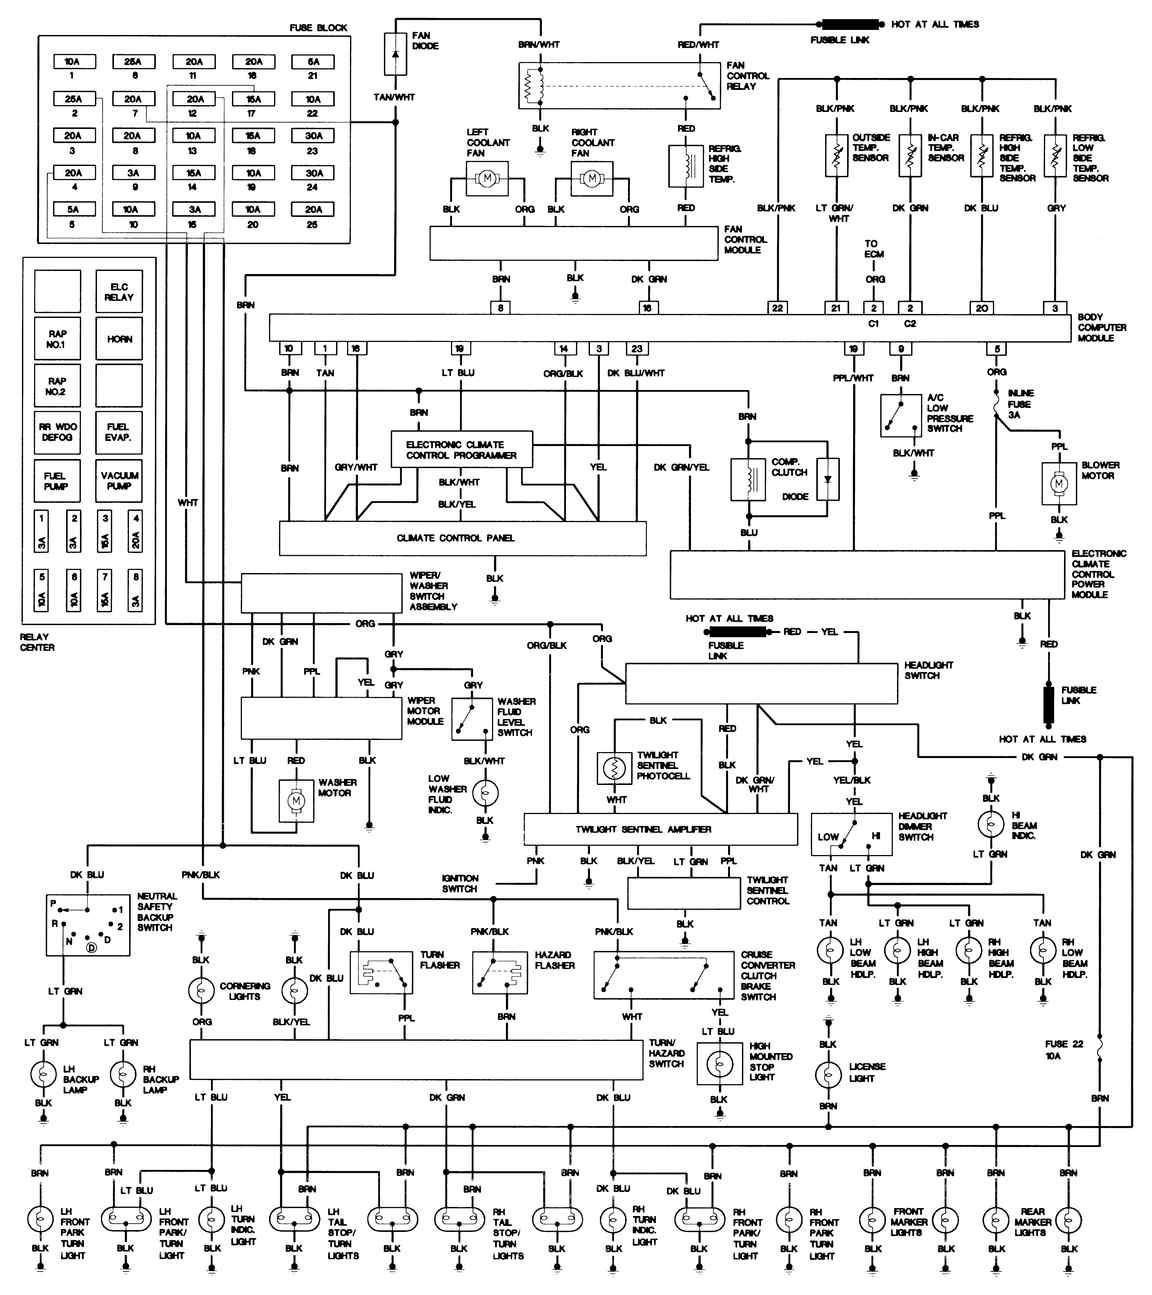 2002 cadillac escalade wiring diagram 29 2002 cadillac deville radio wiring diagram wiring diagram list  29 2002 cadillac deville radio wiring